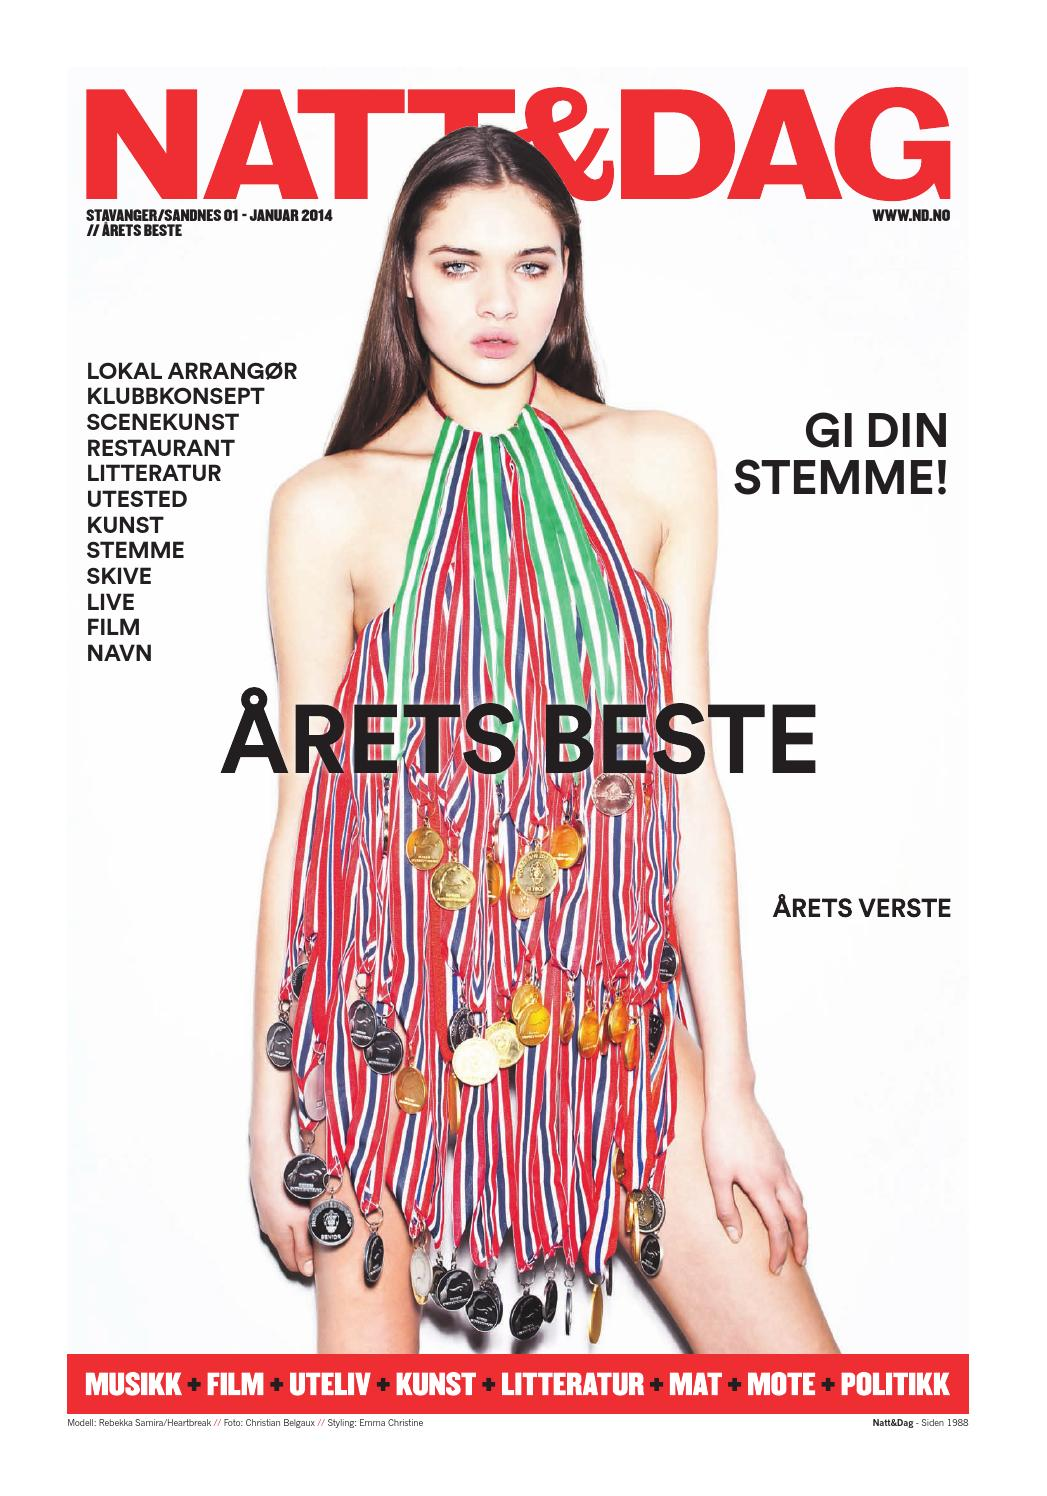 isabella martinsen nakenbilder sex noveller.dk